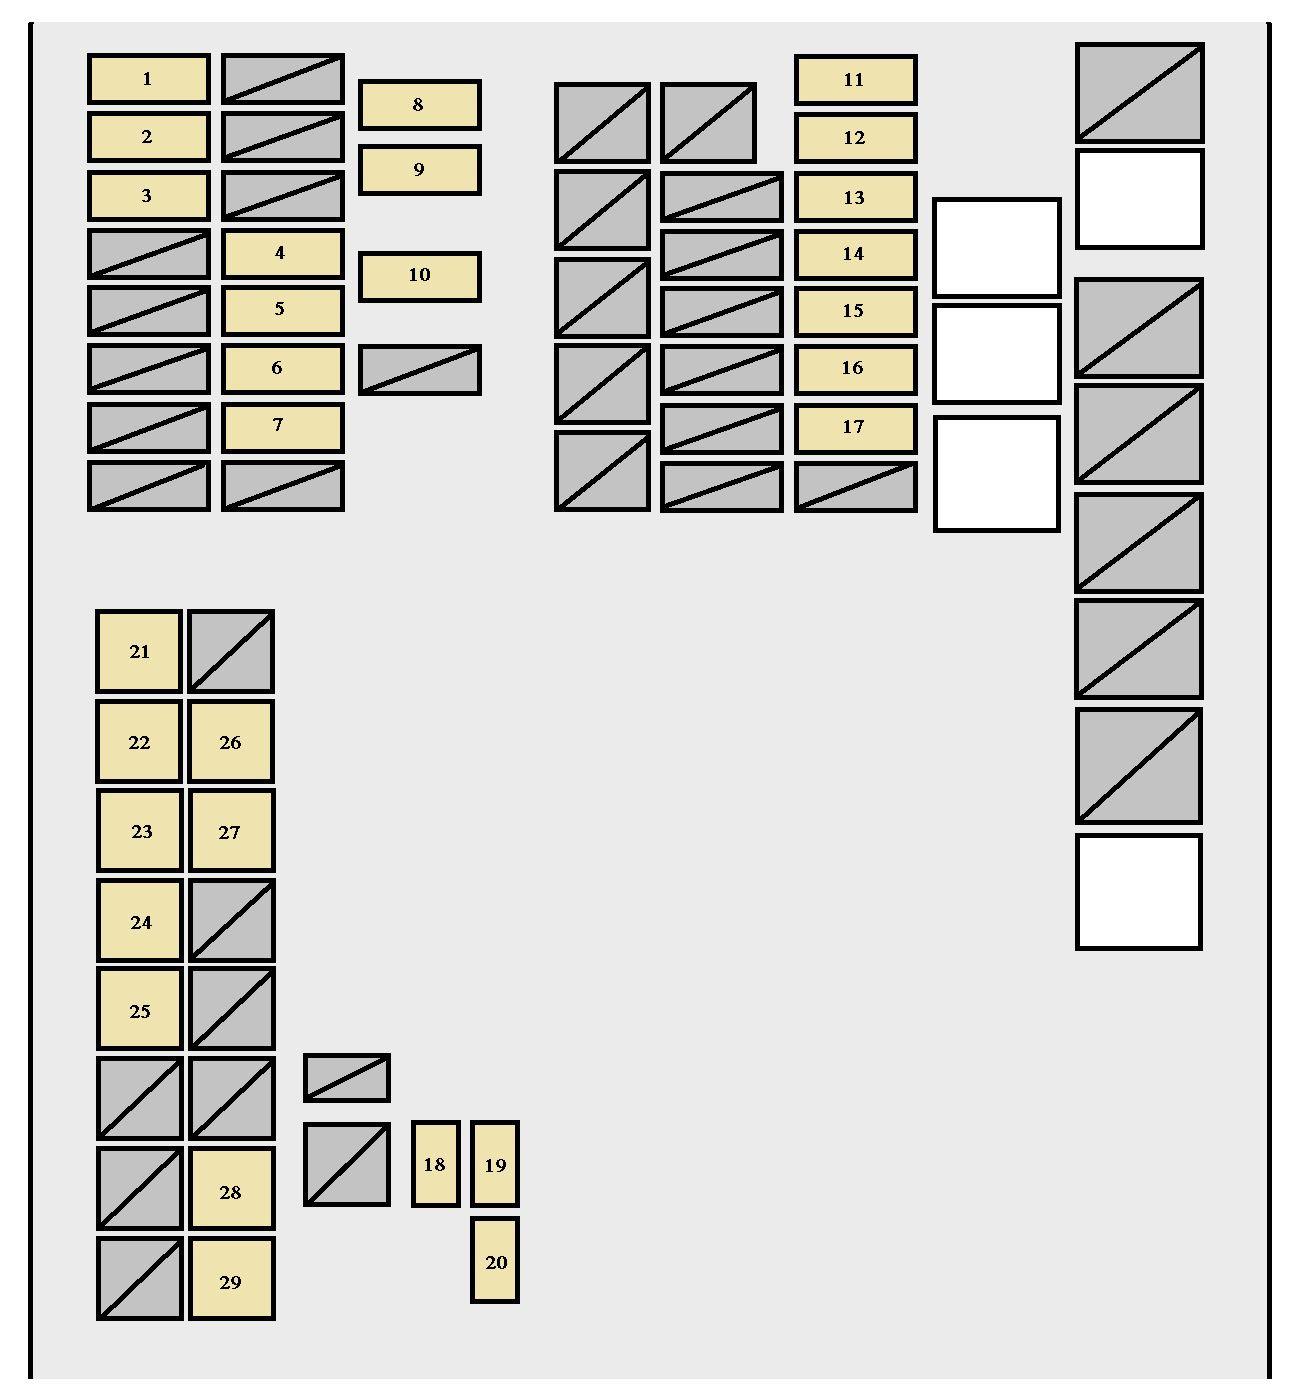 28 2008 Scion Tc Fuse Box Diagram - Wiring Diagram List